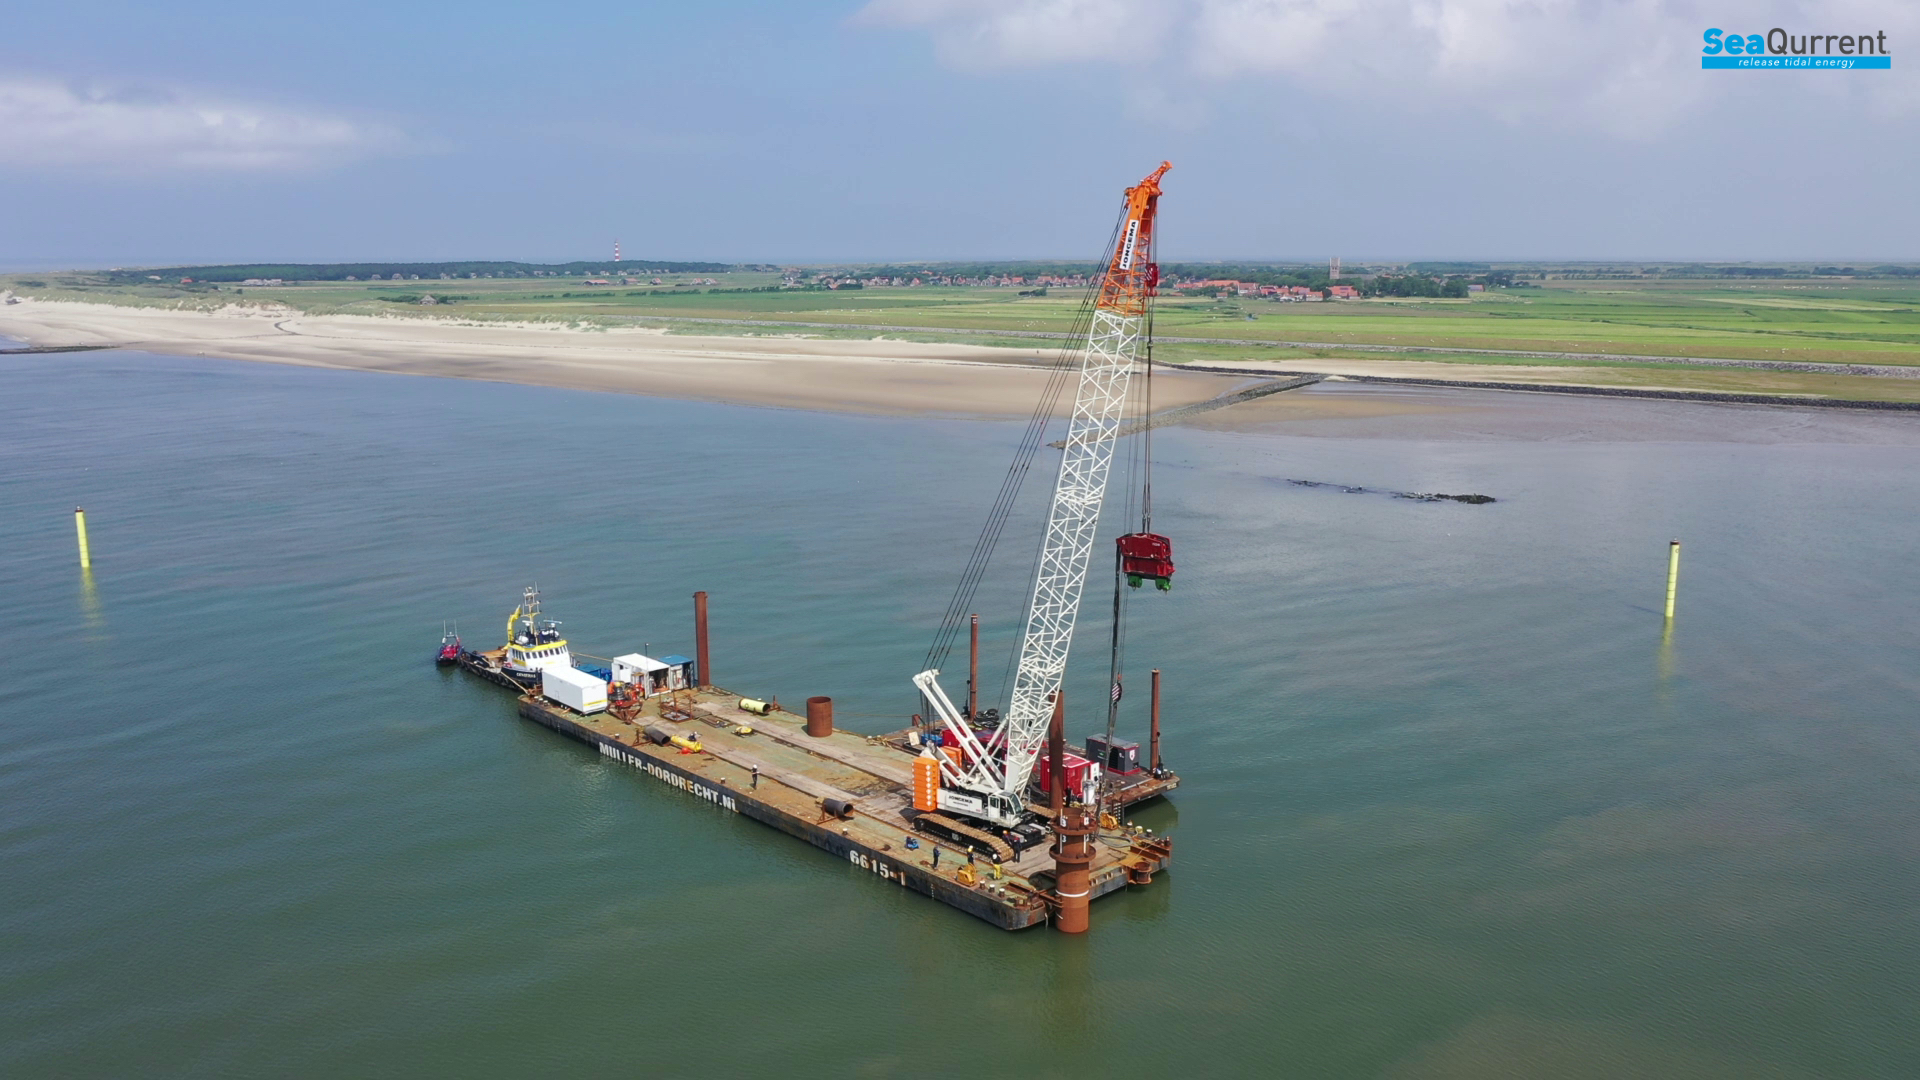 Underwater TidalKite ready for full-scale testing at Ameland